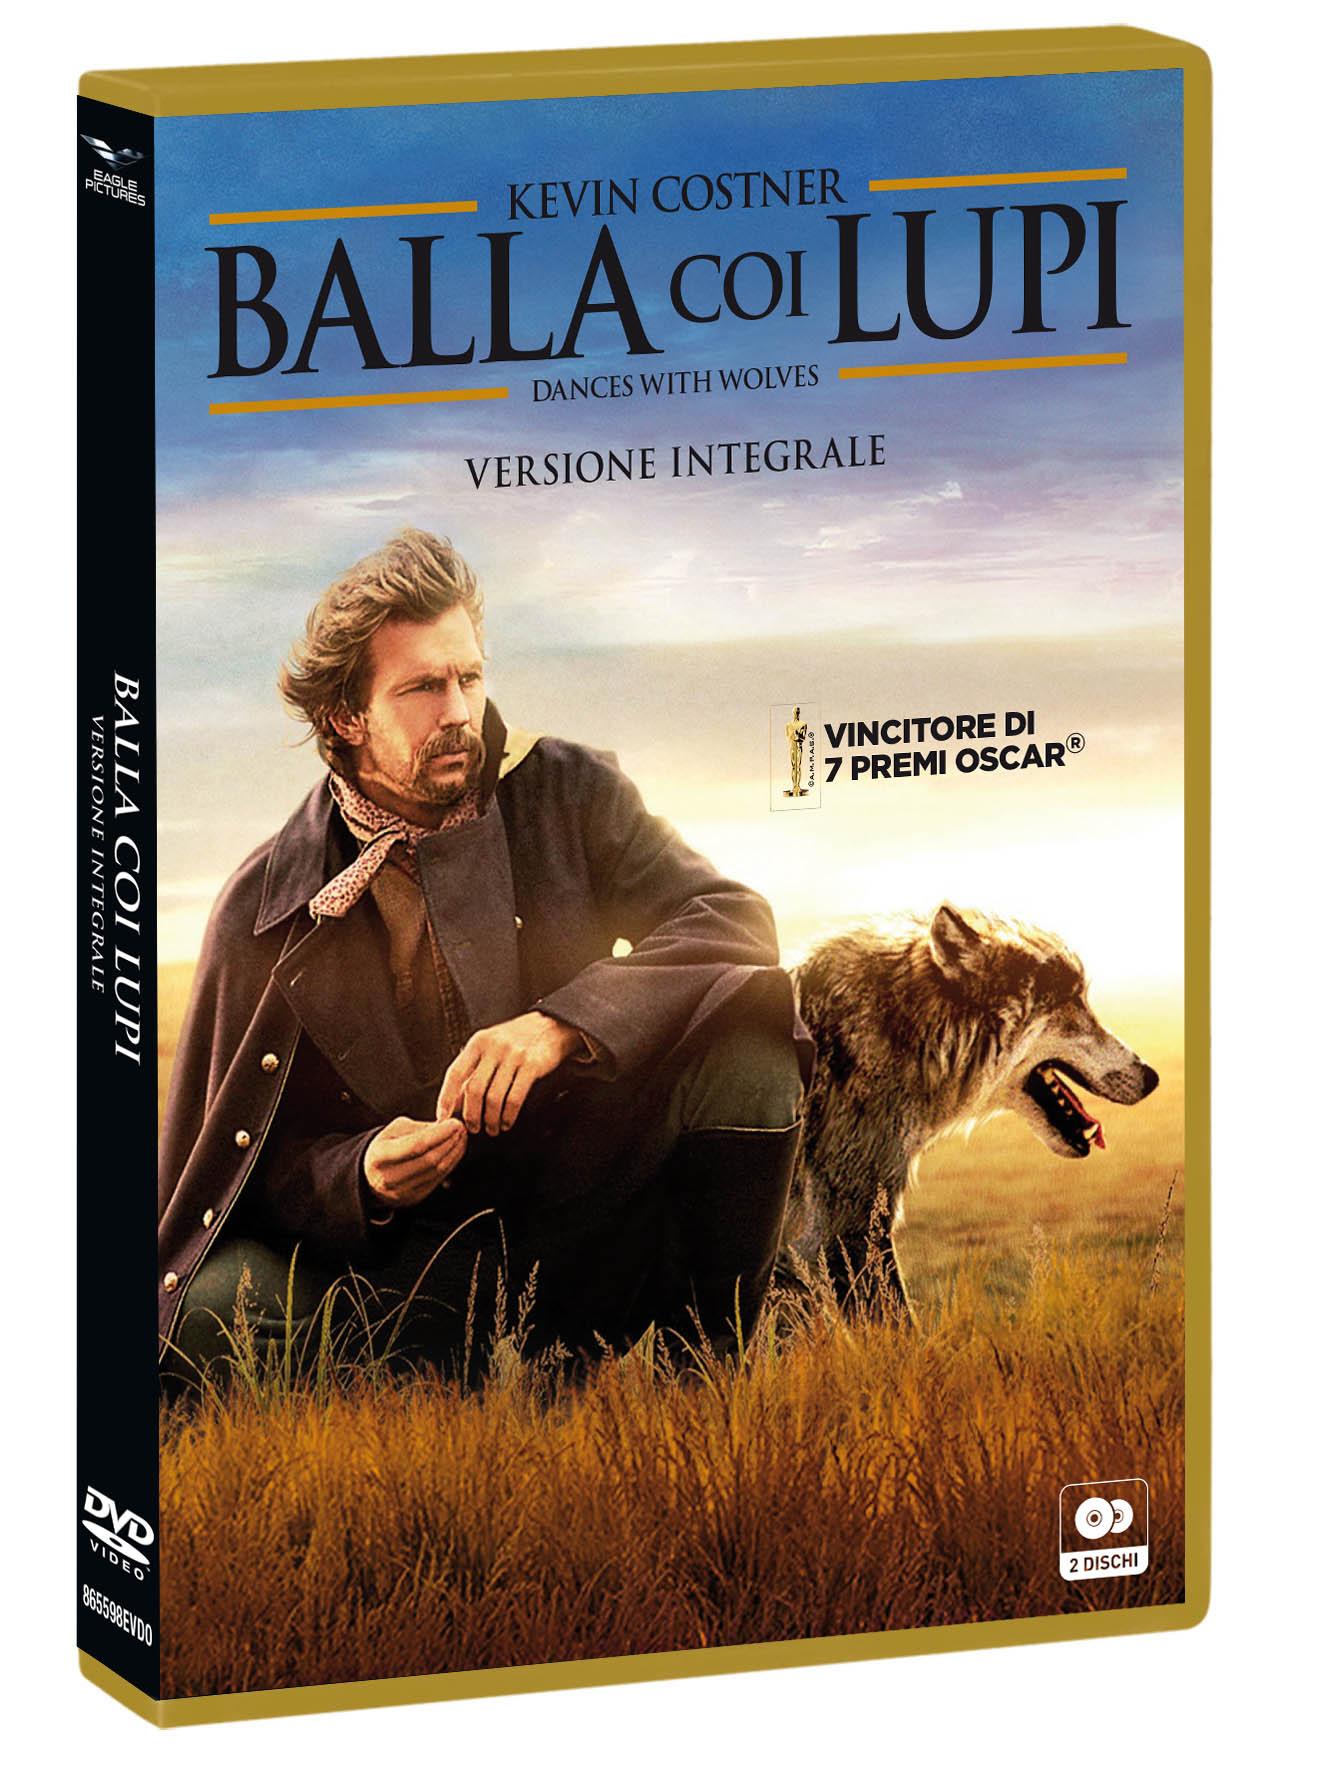 BALLA COI LUPI (2 DVD) (DVD)